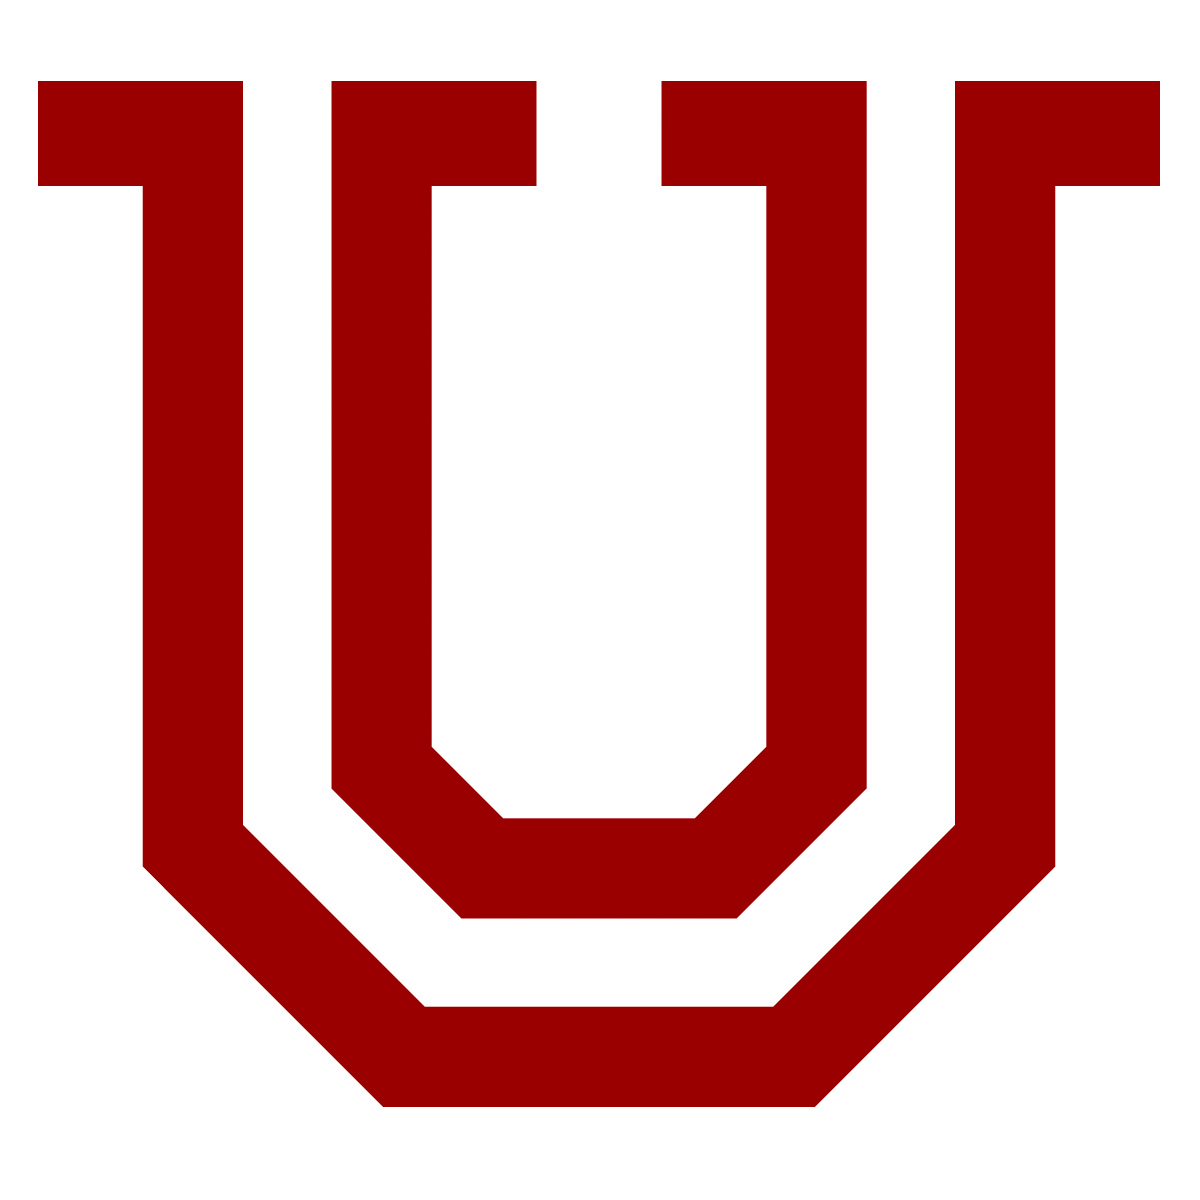 Union college clipart banner free stock Athletic Logo Digital Files | University Logos | Branding ... banner free stock